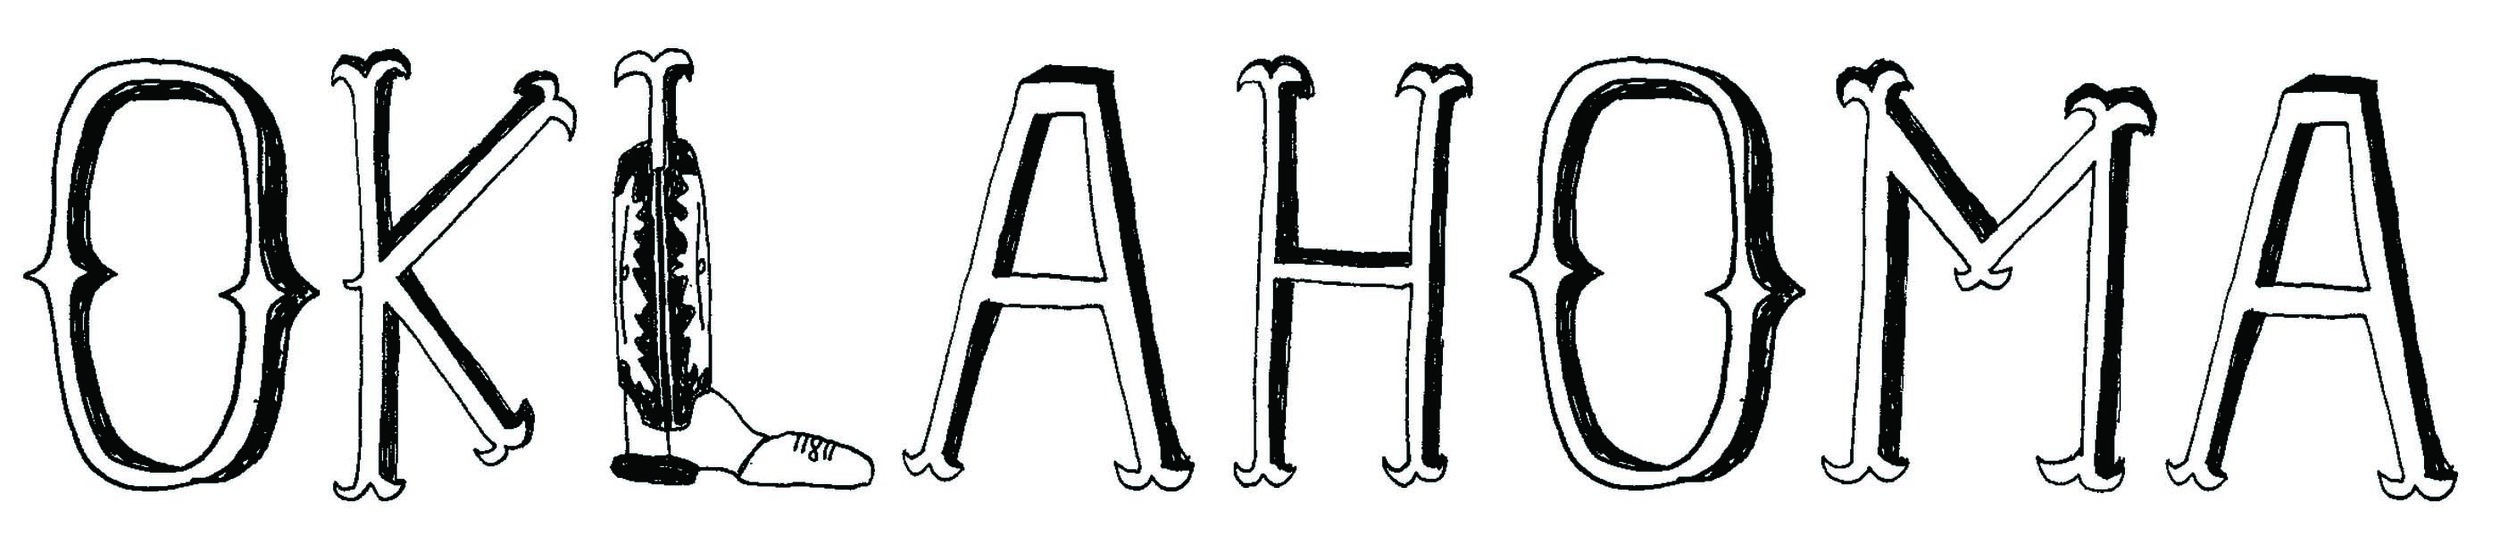 oklahoma typeface.jpg